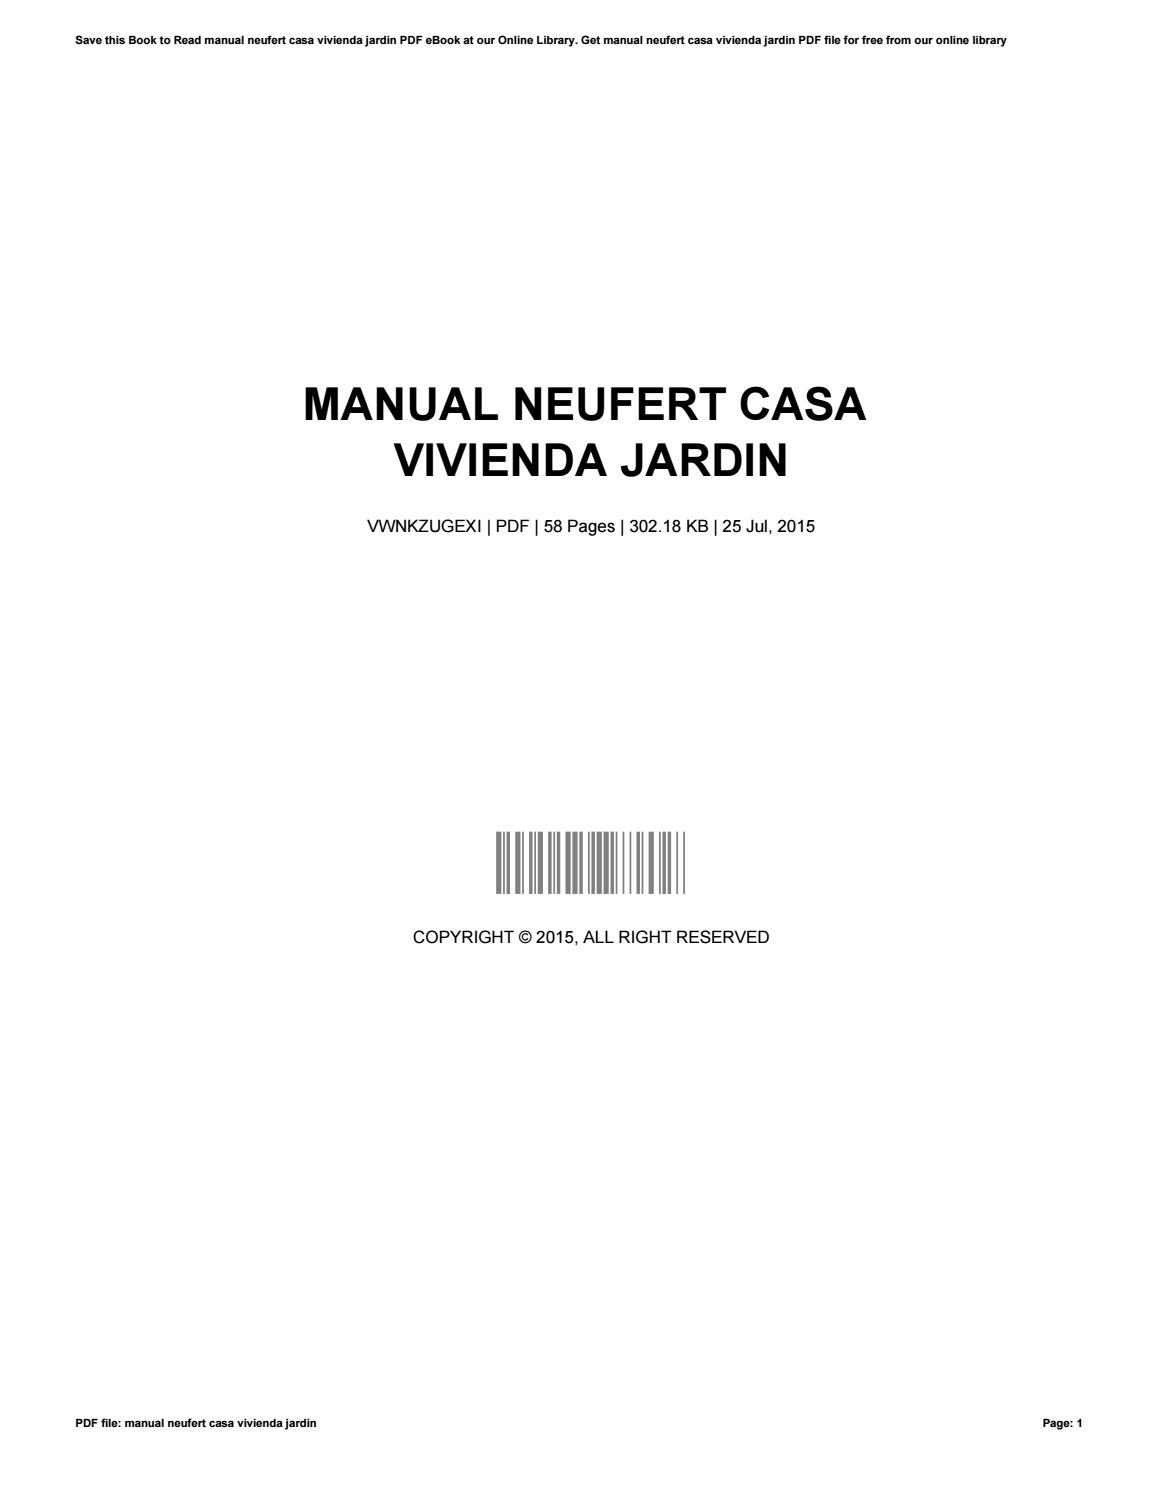 Manual Neufert Casa Vivienda Jardin By Martymccune46921 Issuu